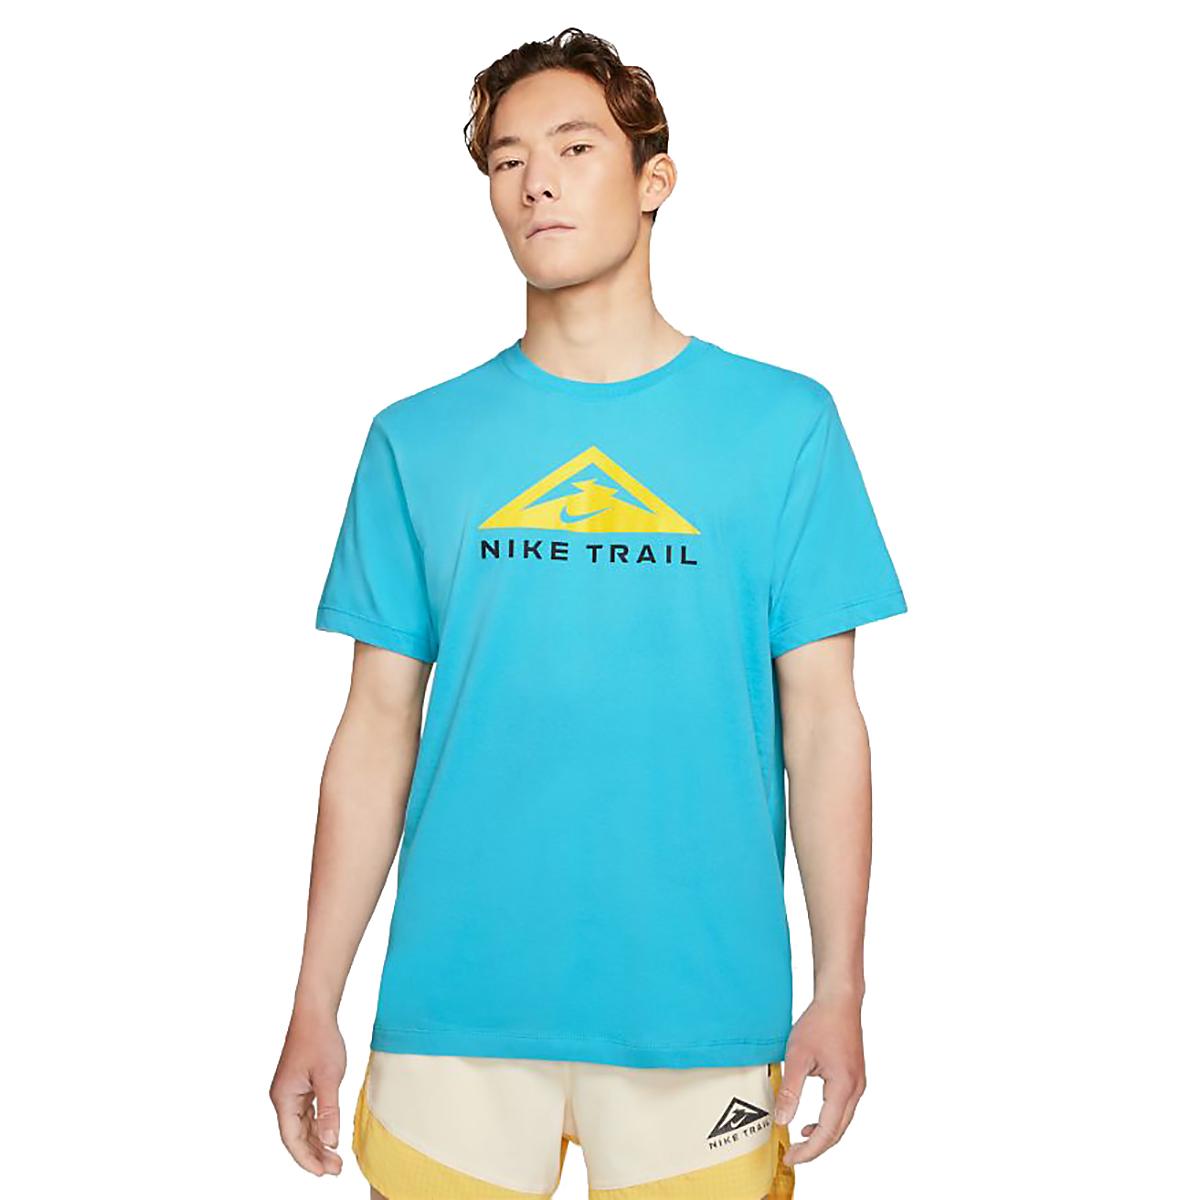 Men's Nike Dri-FIT Short-Sleeve Trail Running T-Shirt - Color: Chlorine Blue - Size: XS, Chlorine Blue, large, image 1